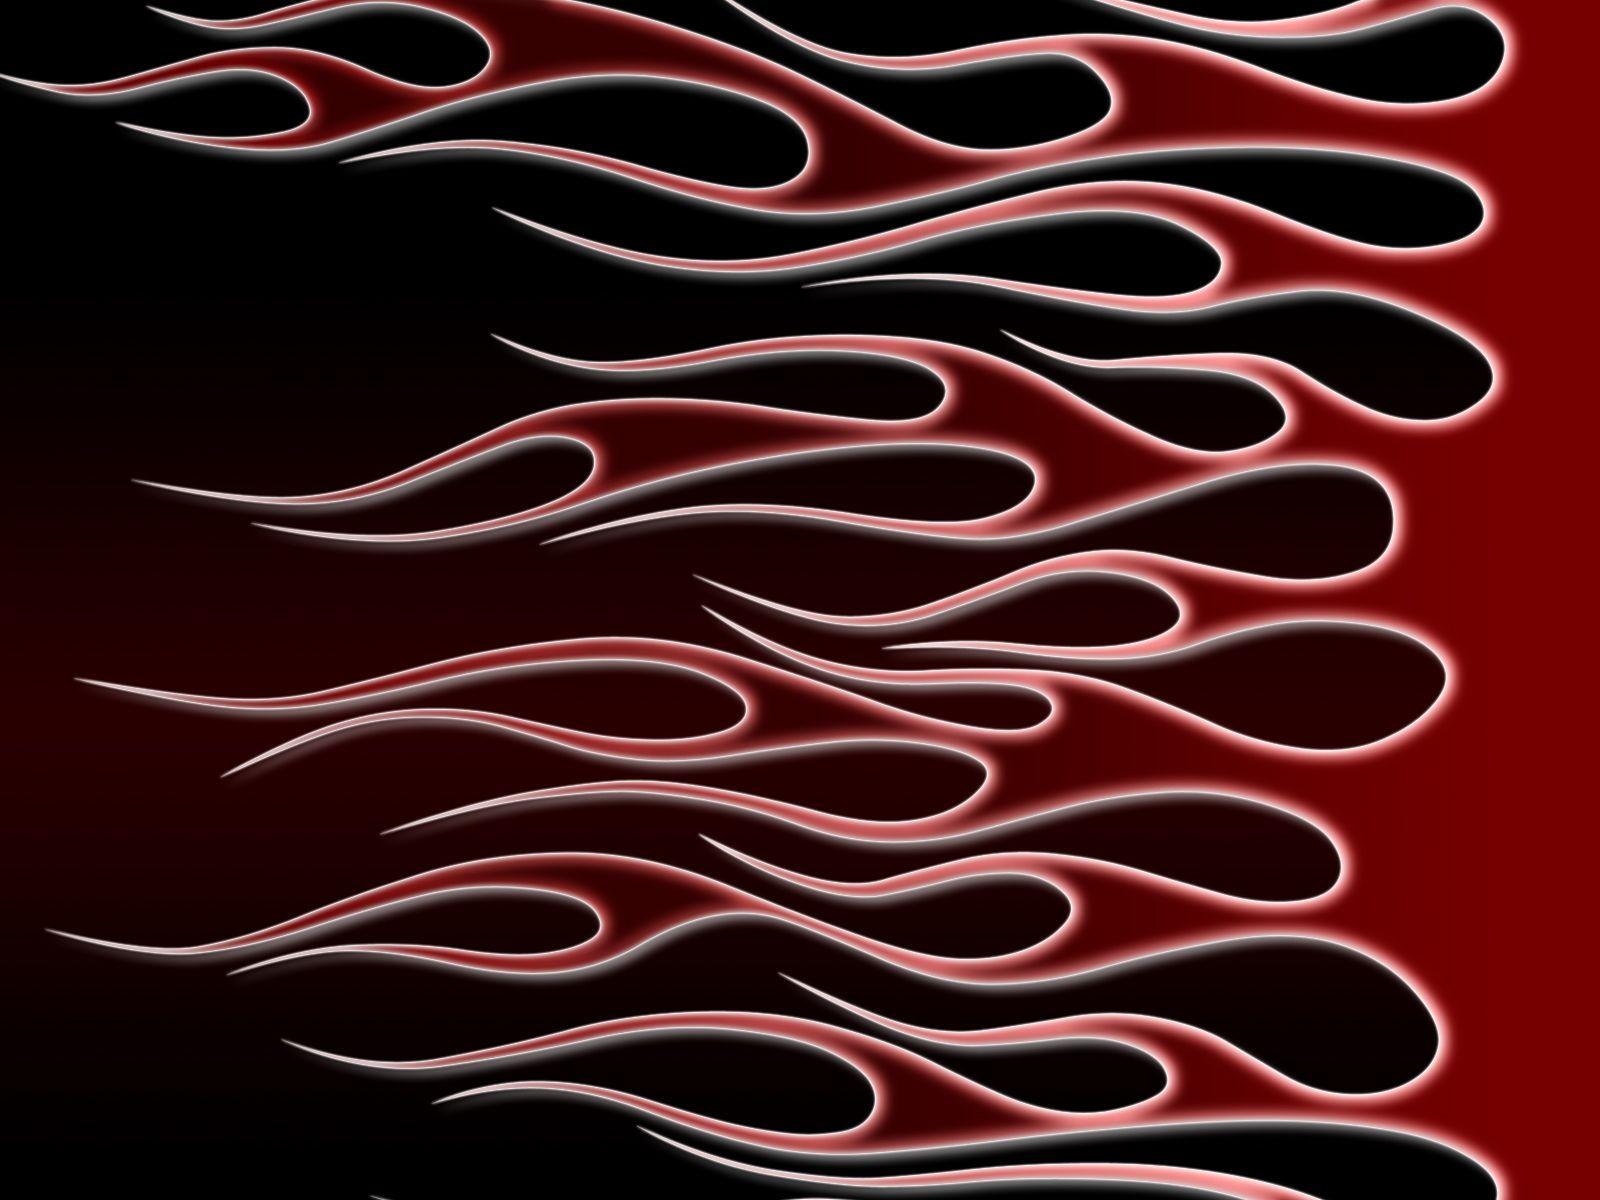 Harley Flames Clip Art Harley Davidson Flames Clipart